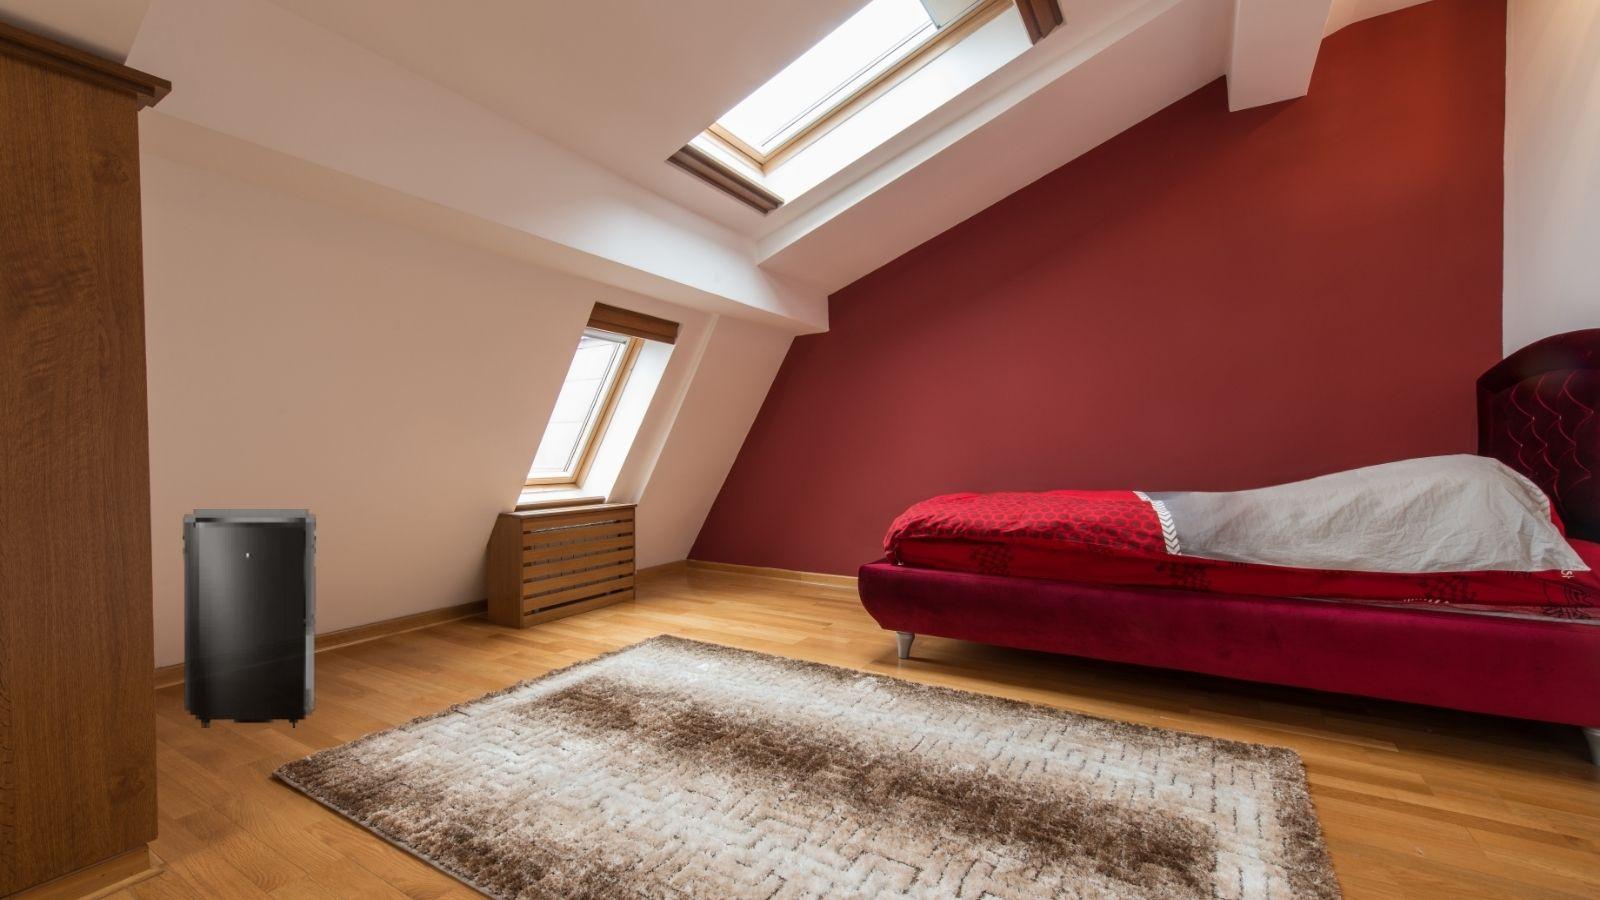 Best dehumidifier for attic